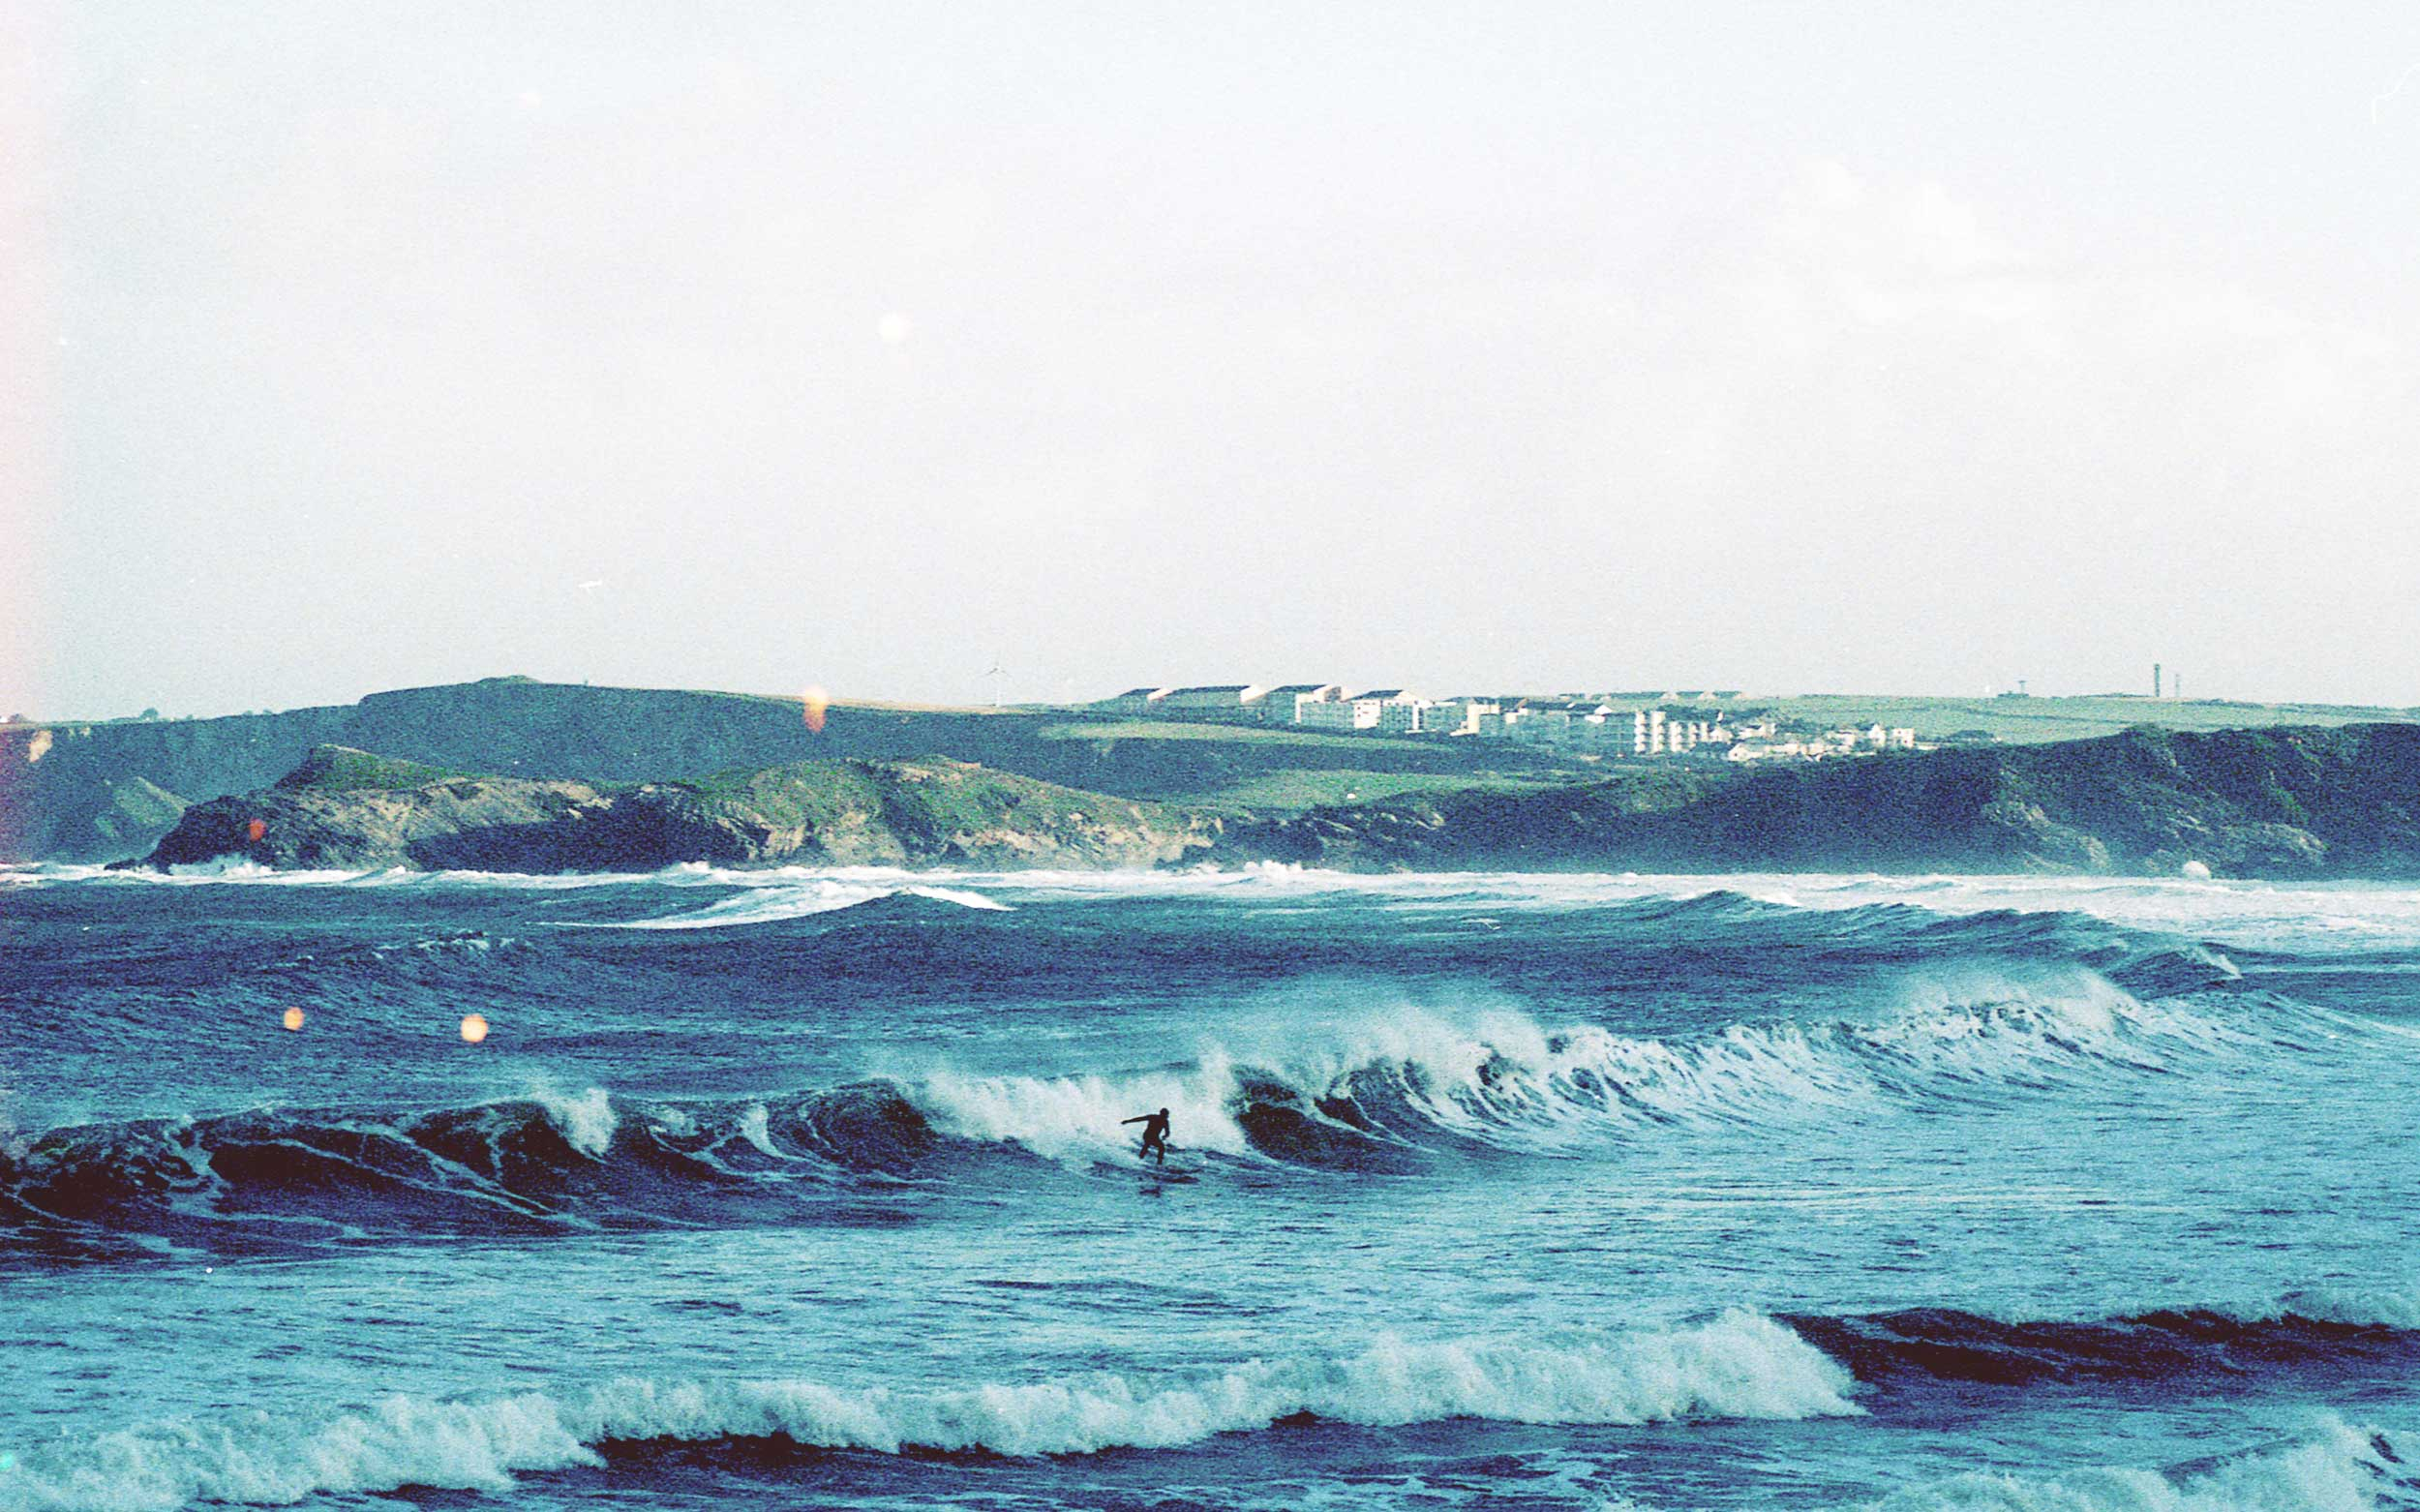 Surfer+riding+the+waves+at+Towan+Beach+_+Karl+Mackie+Photography.jpeg